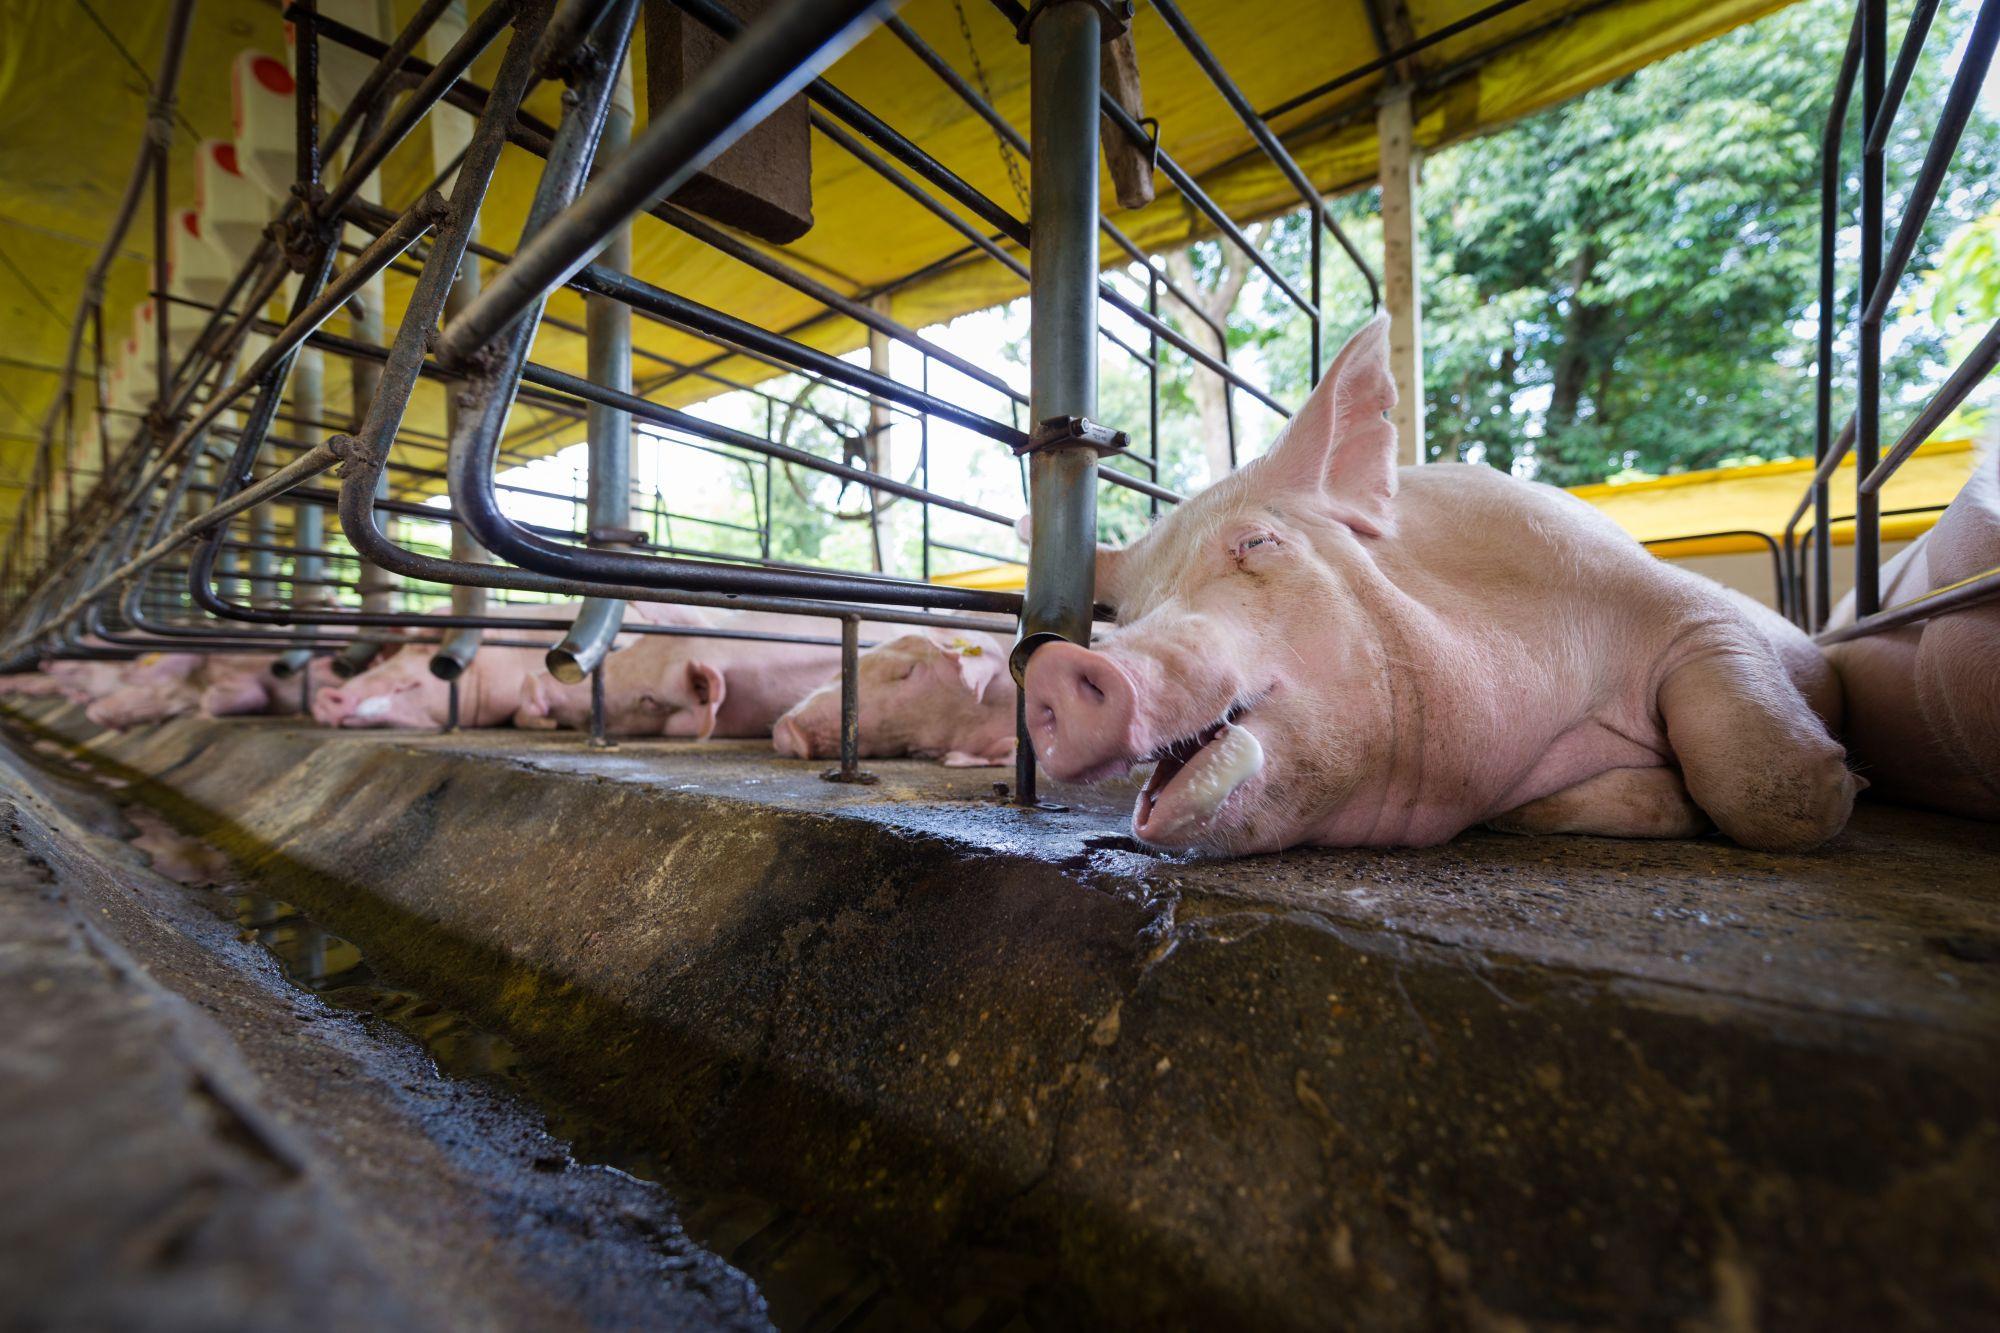 Pigs, Latin America